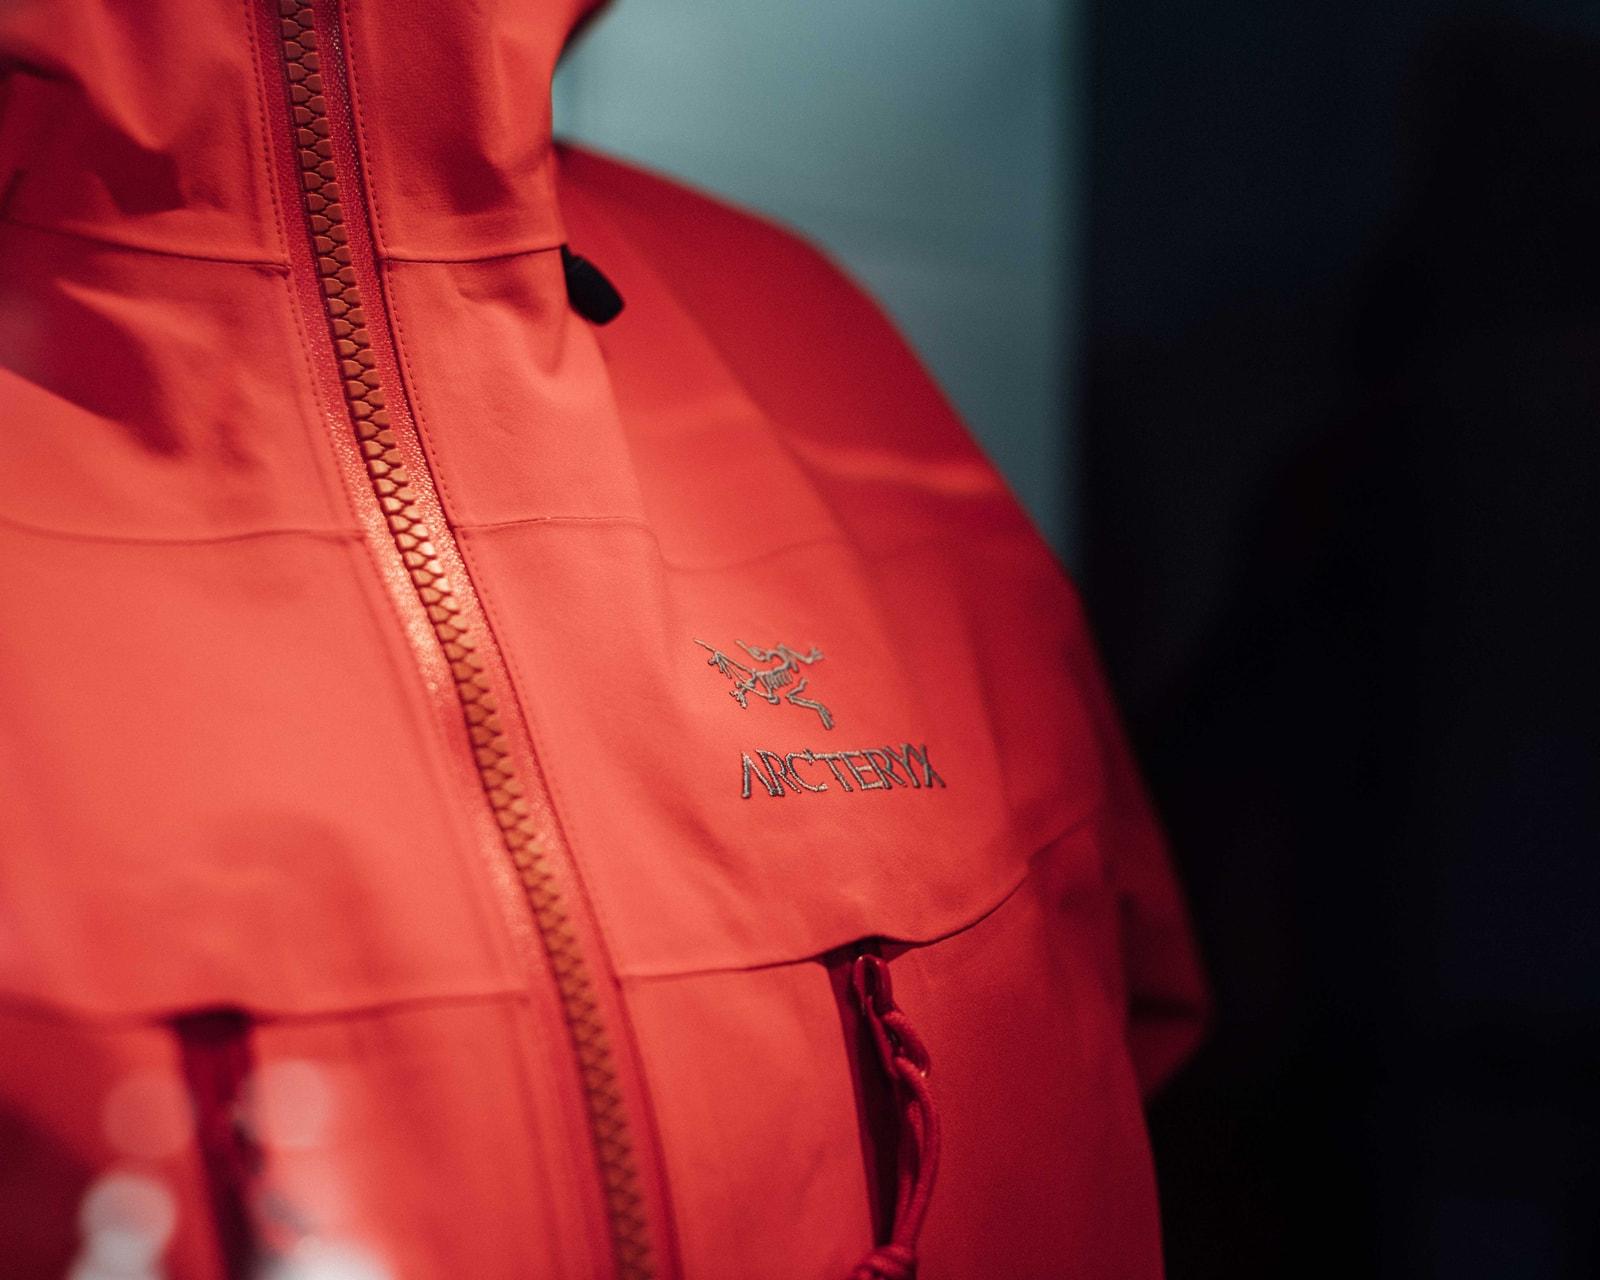 Arc'teryx GORE-TEX Off-White Virgil Abloh Streetwear Vancouver